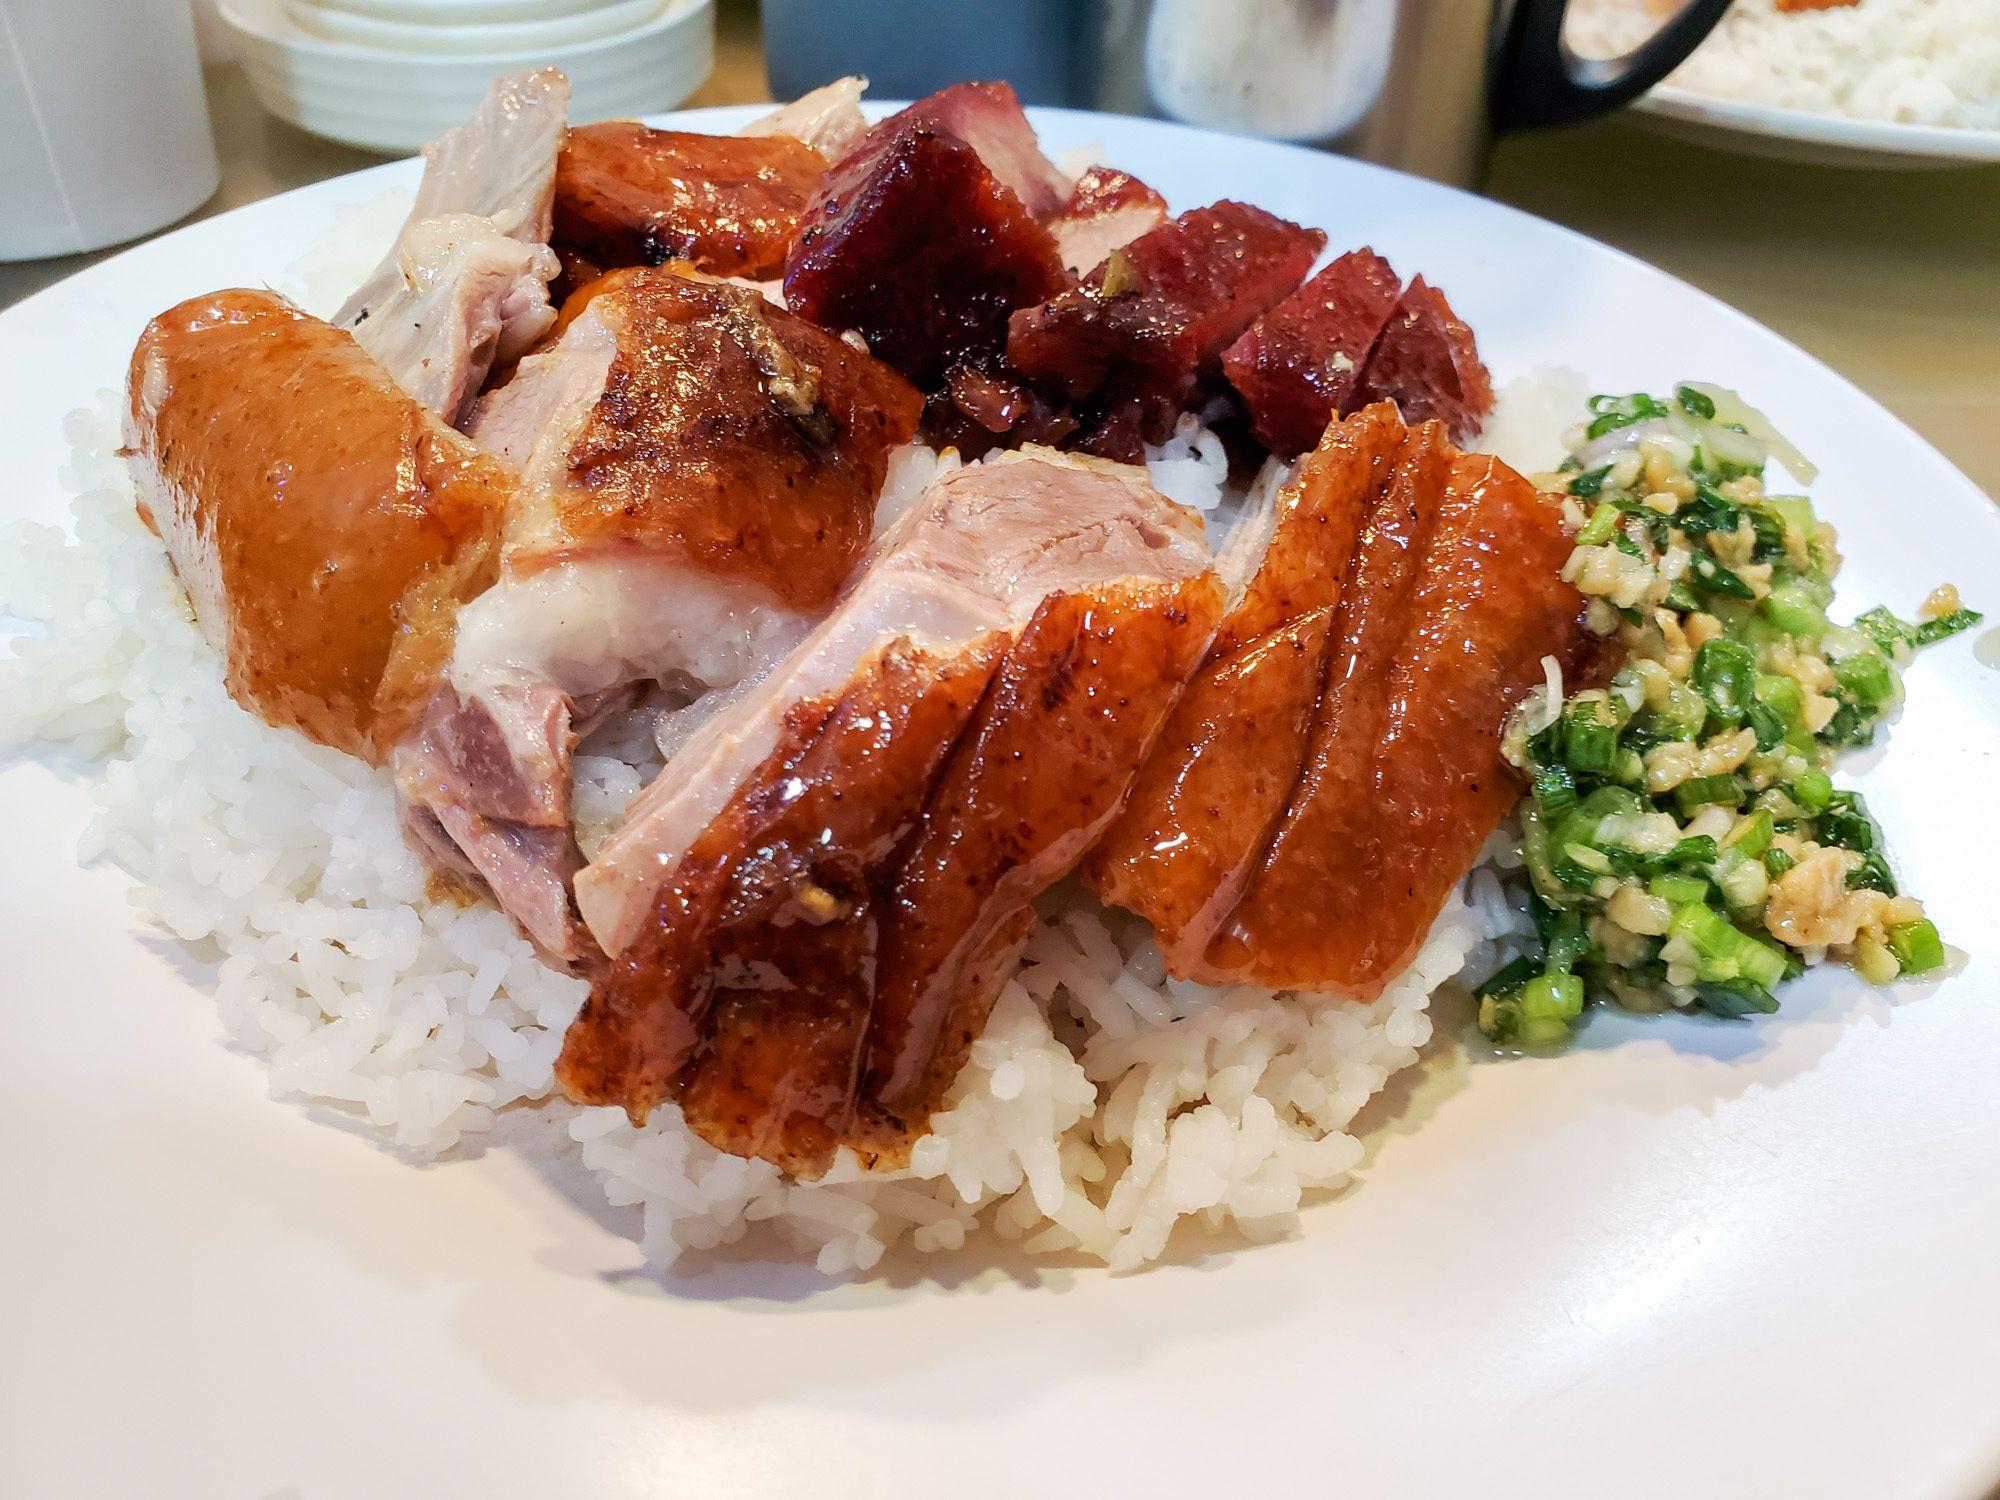 Joy hing chicken and bbq pork